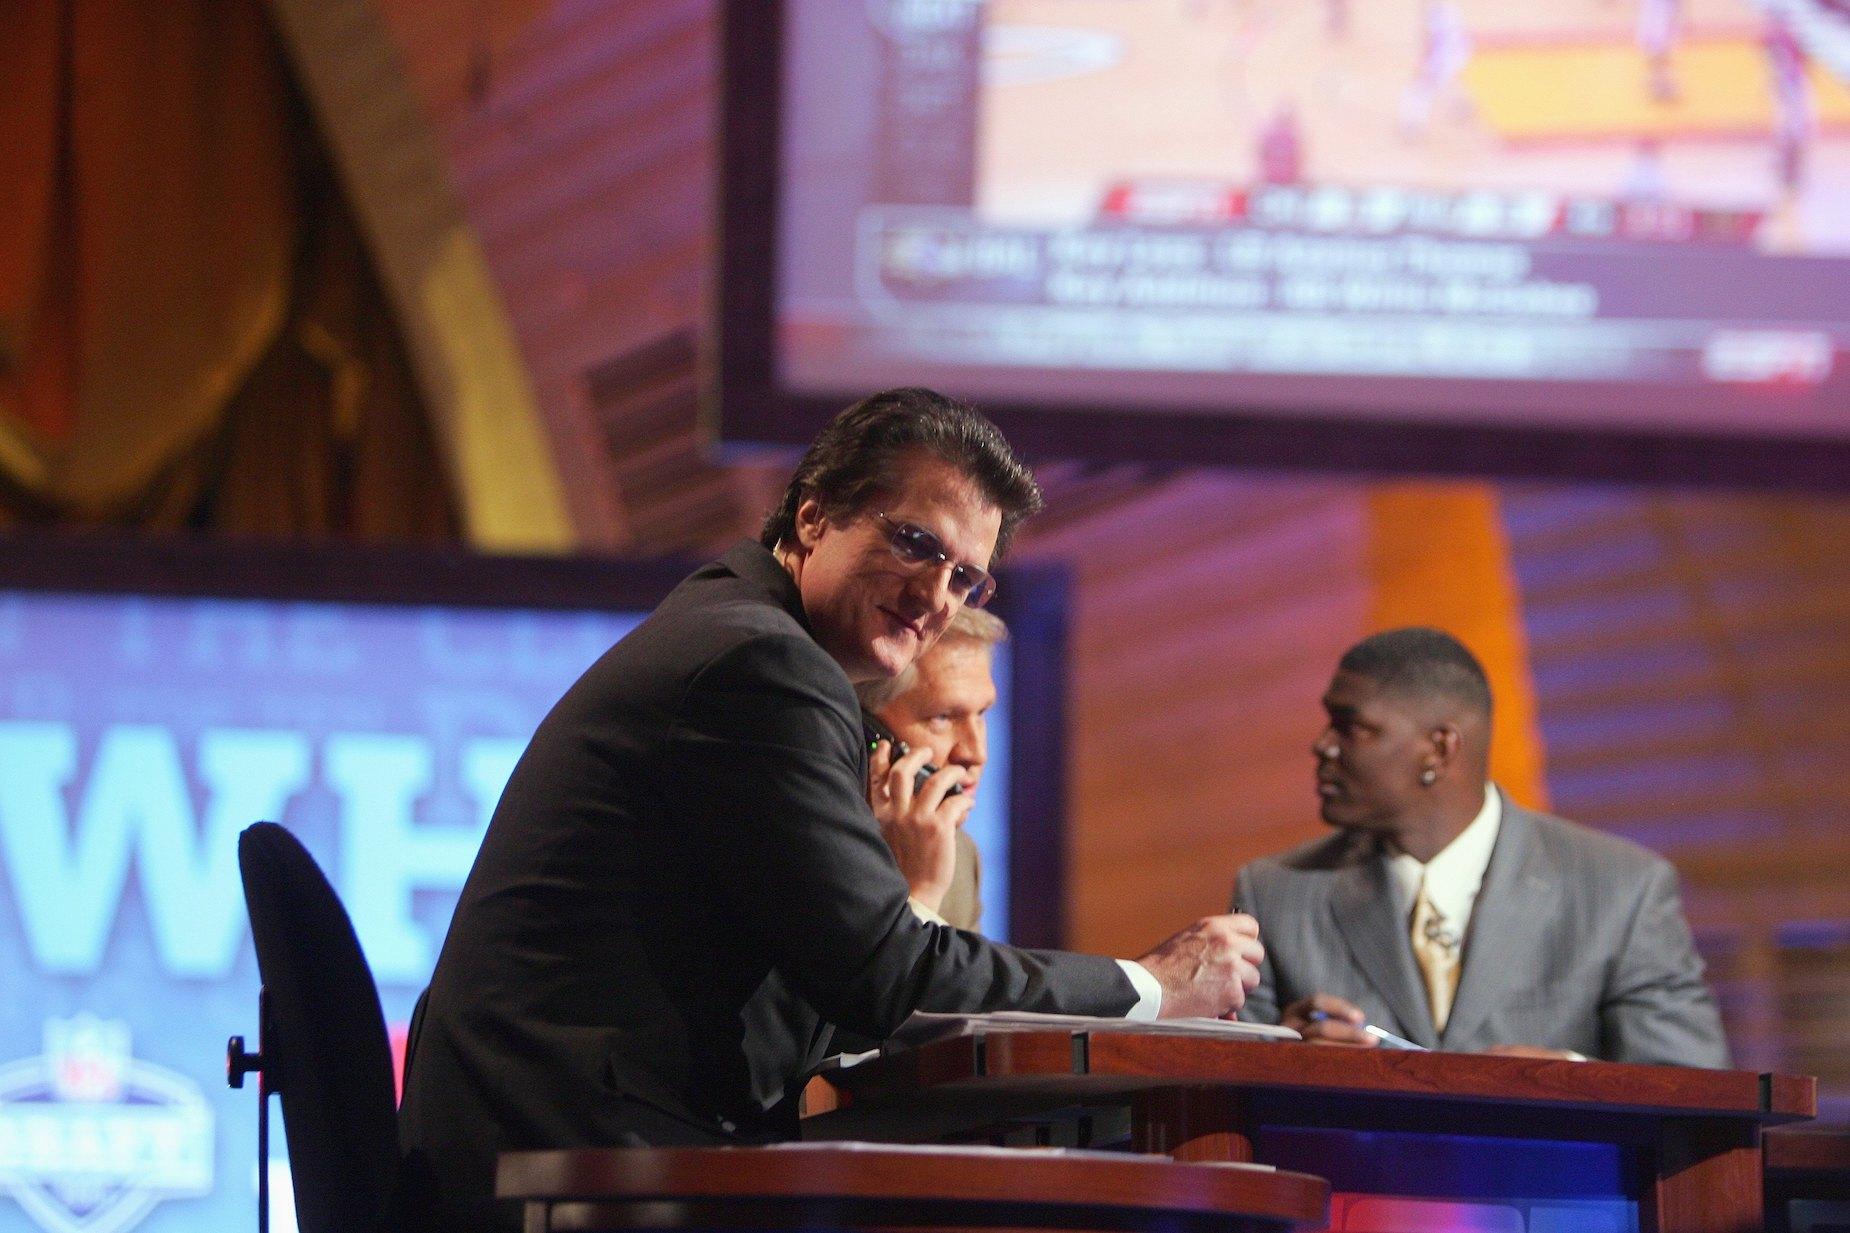 Mel Kiper Jr. Has Kept a Bathroom-Related Streak Alive for 37 Straight NFL Drafts